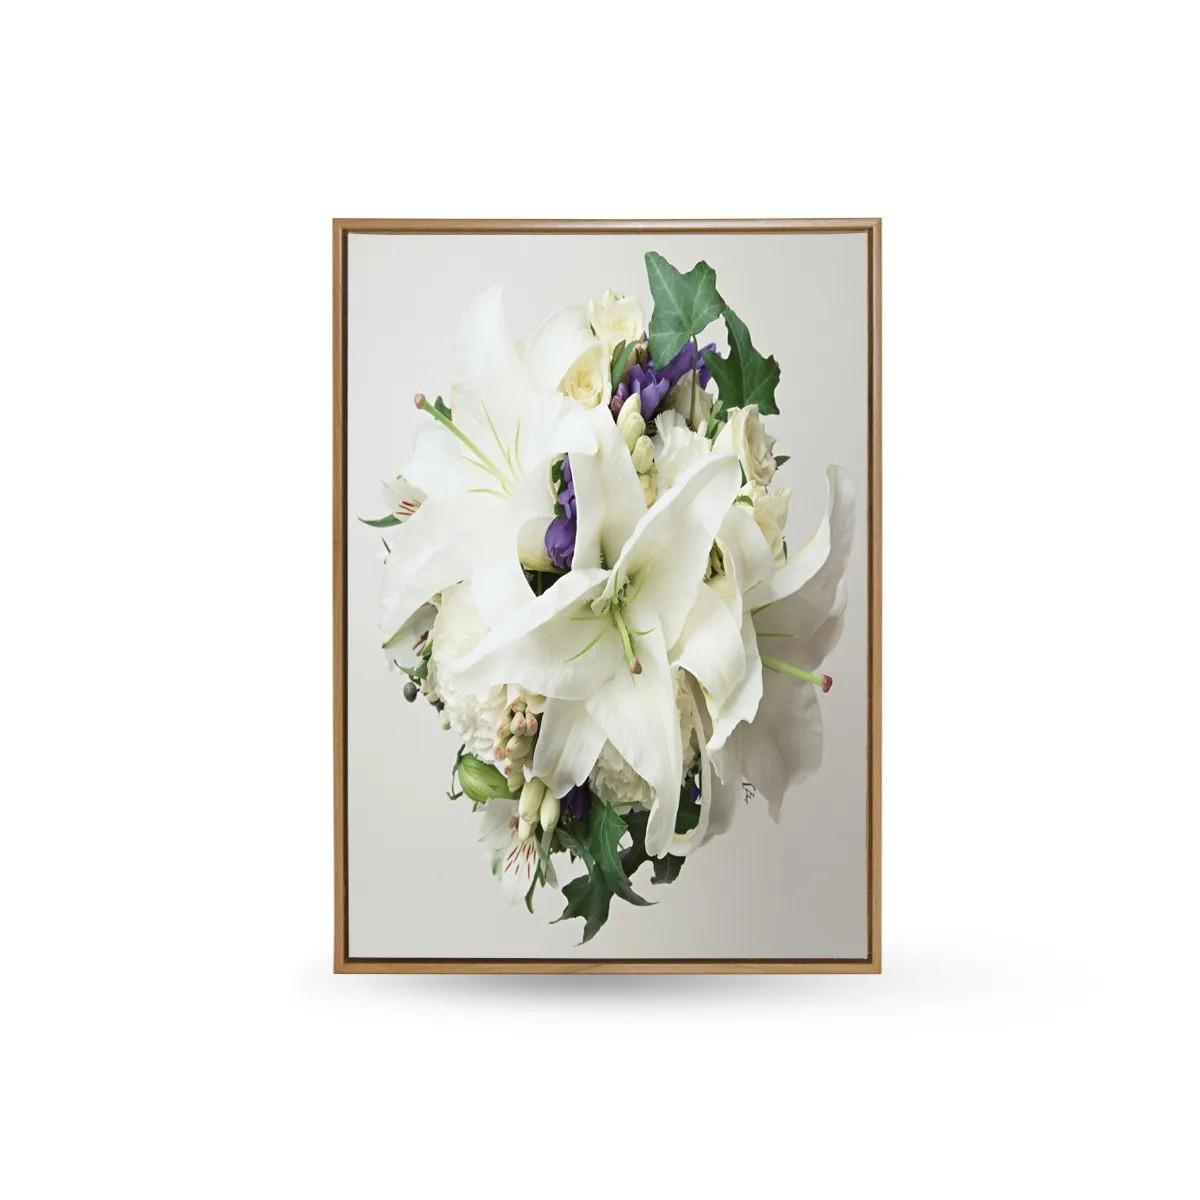 Quadro Decor Buquet Copo De Leite Branco